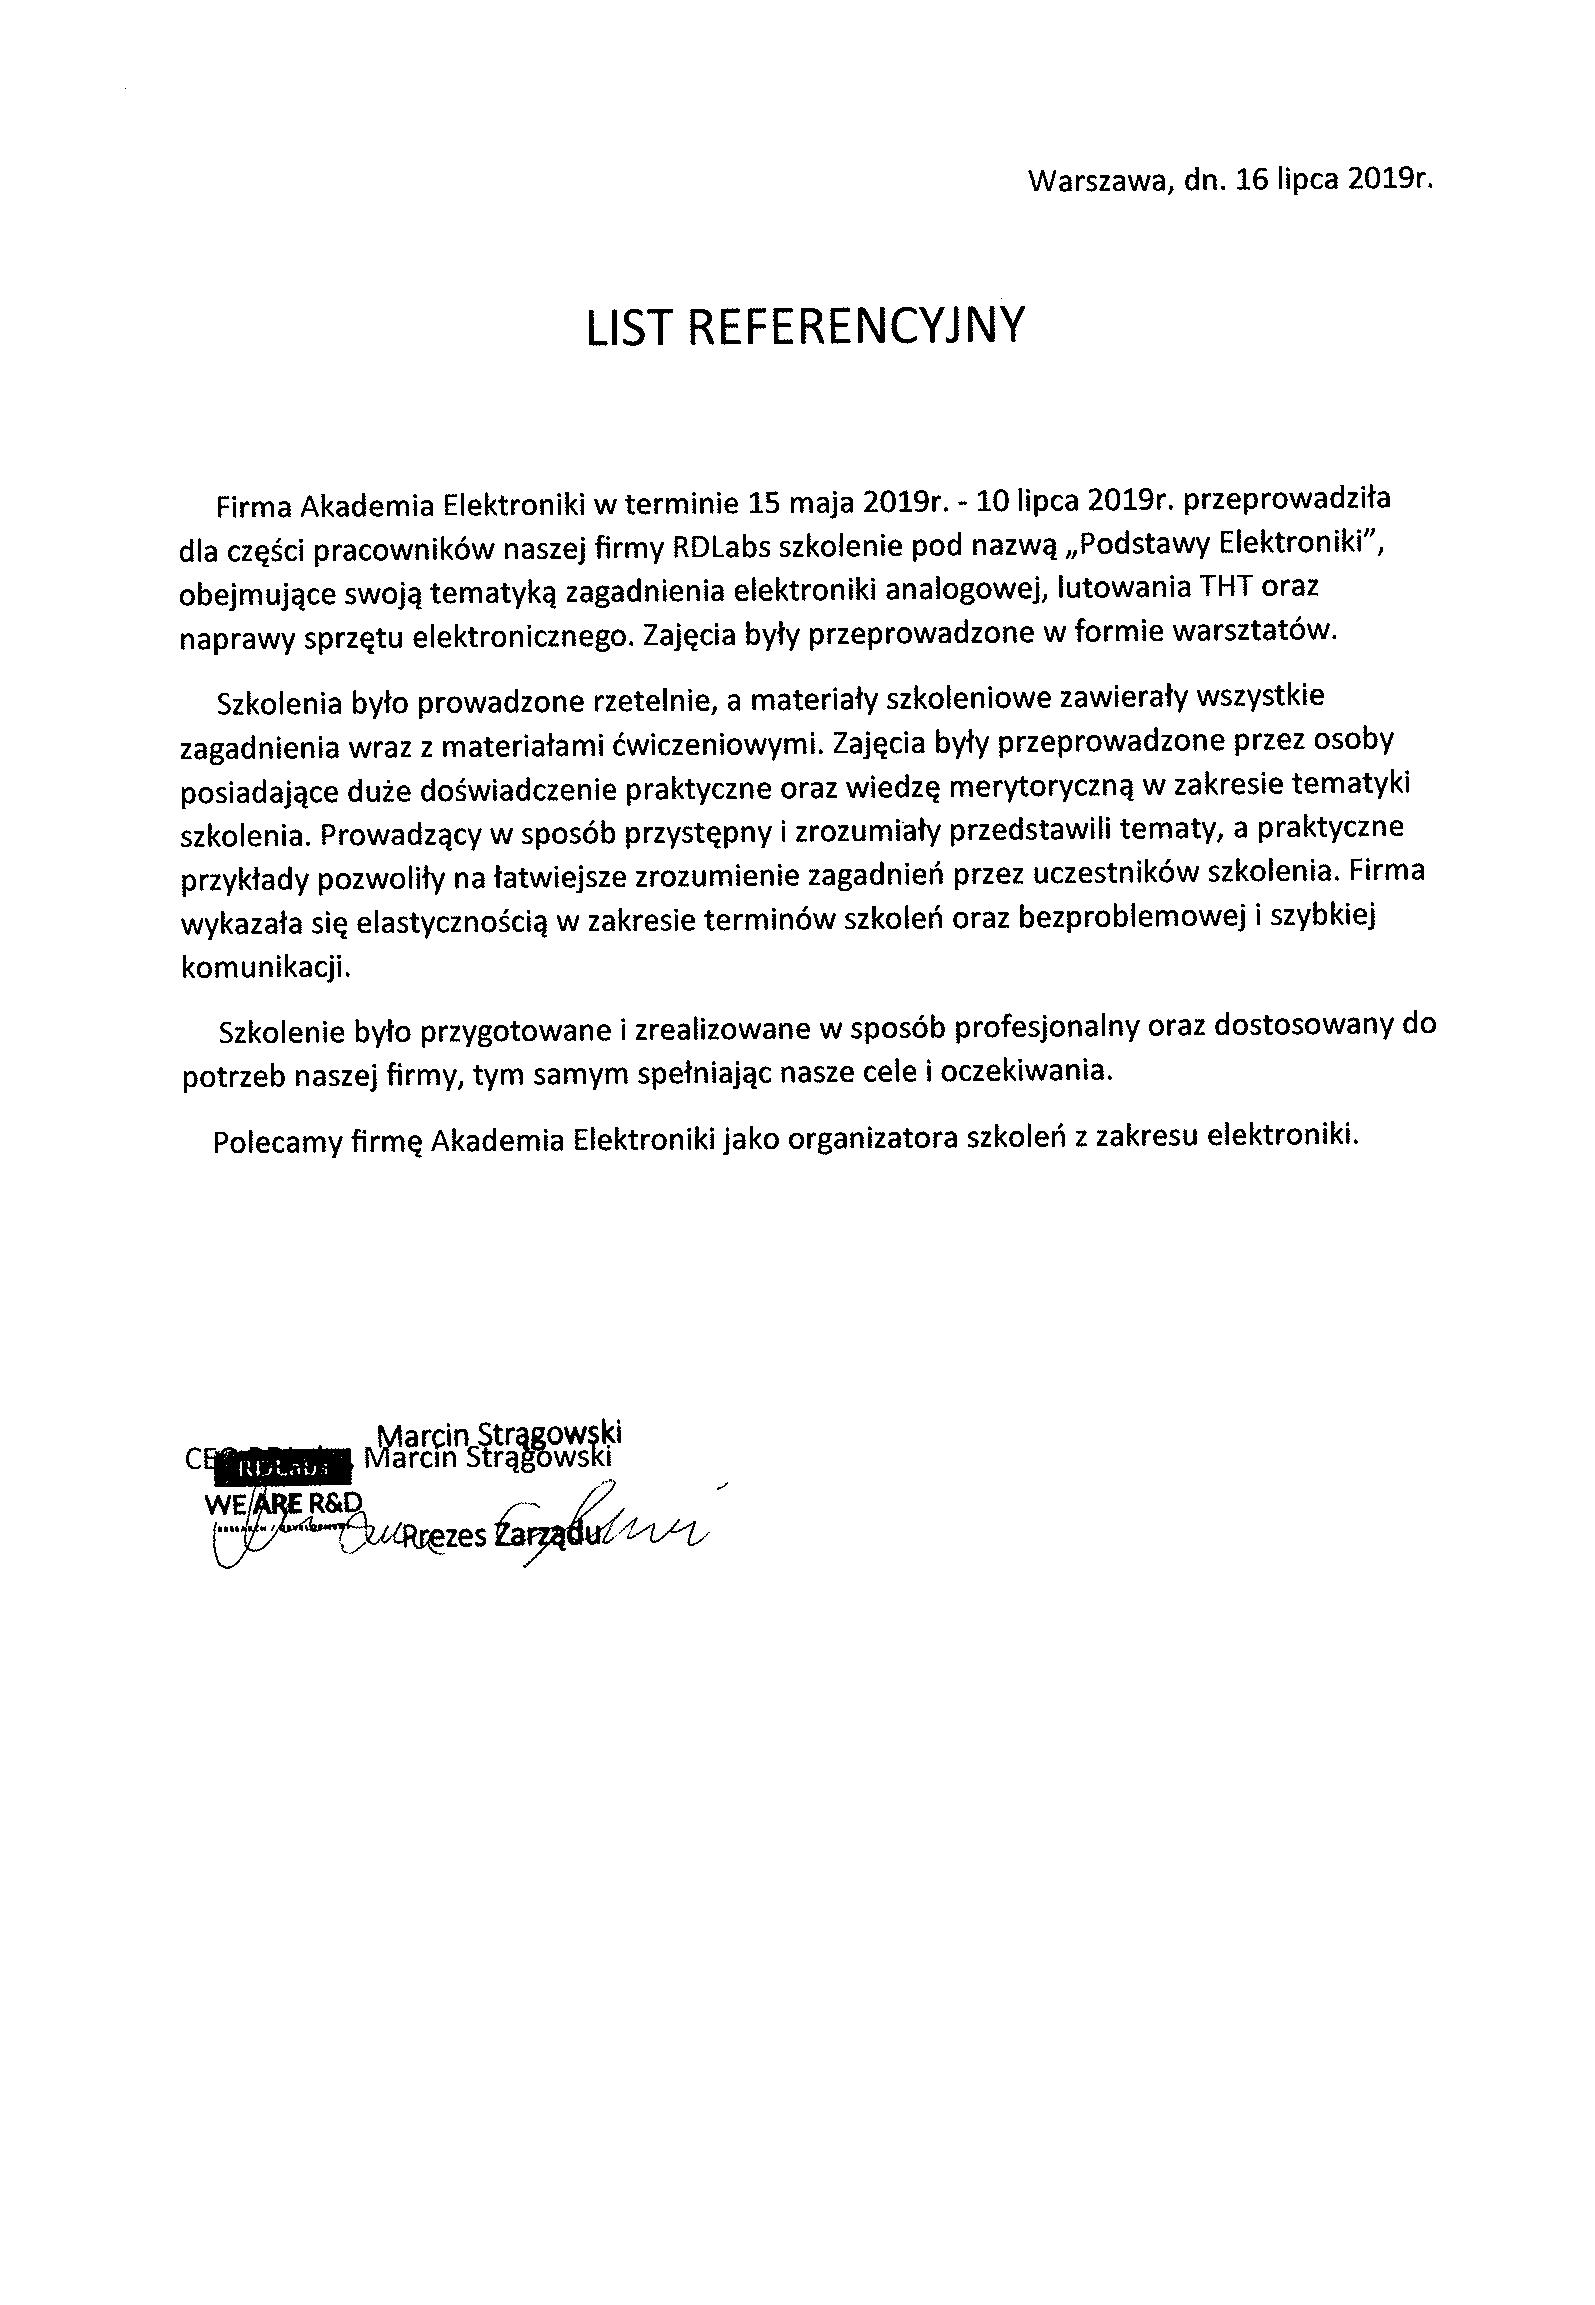 List Referencyjny RDLabs